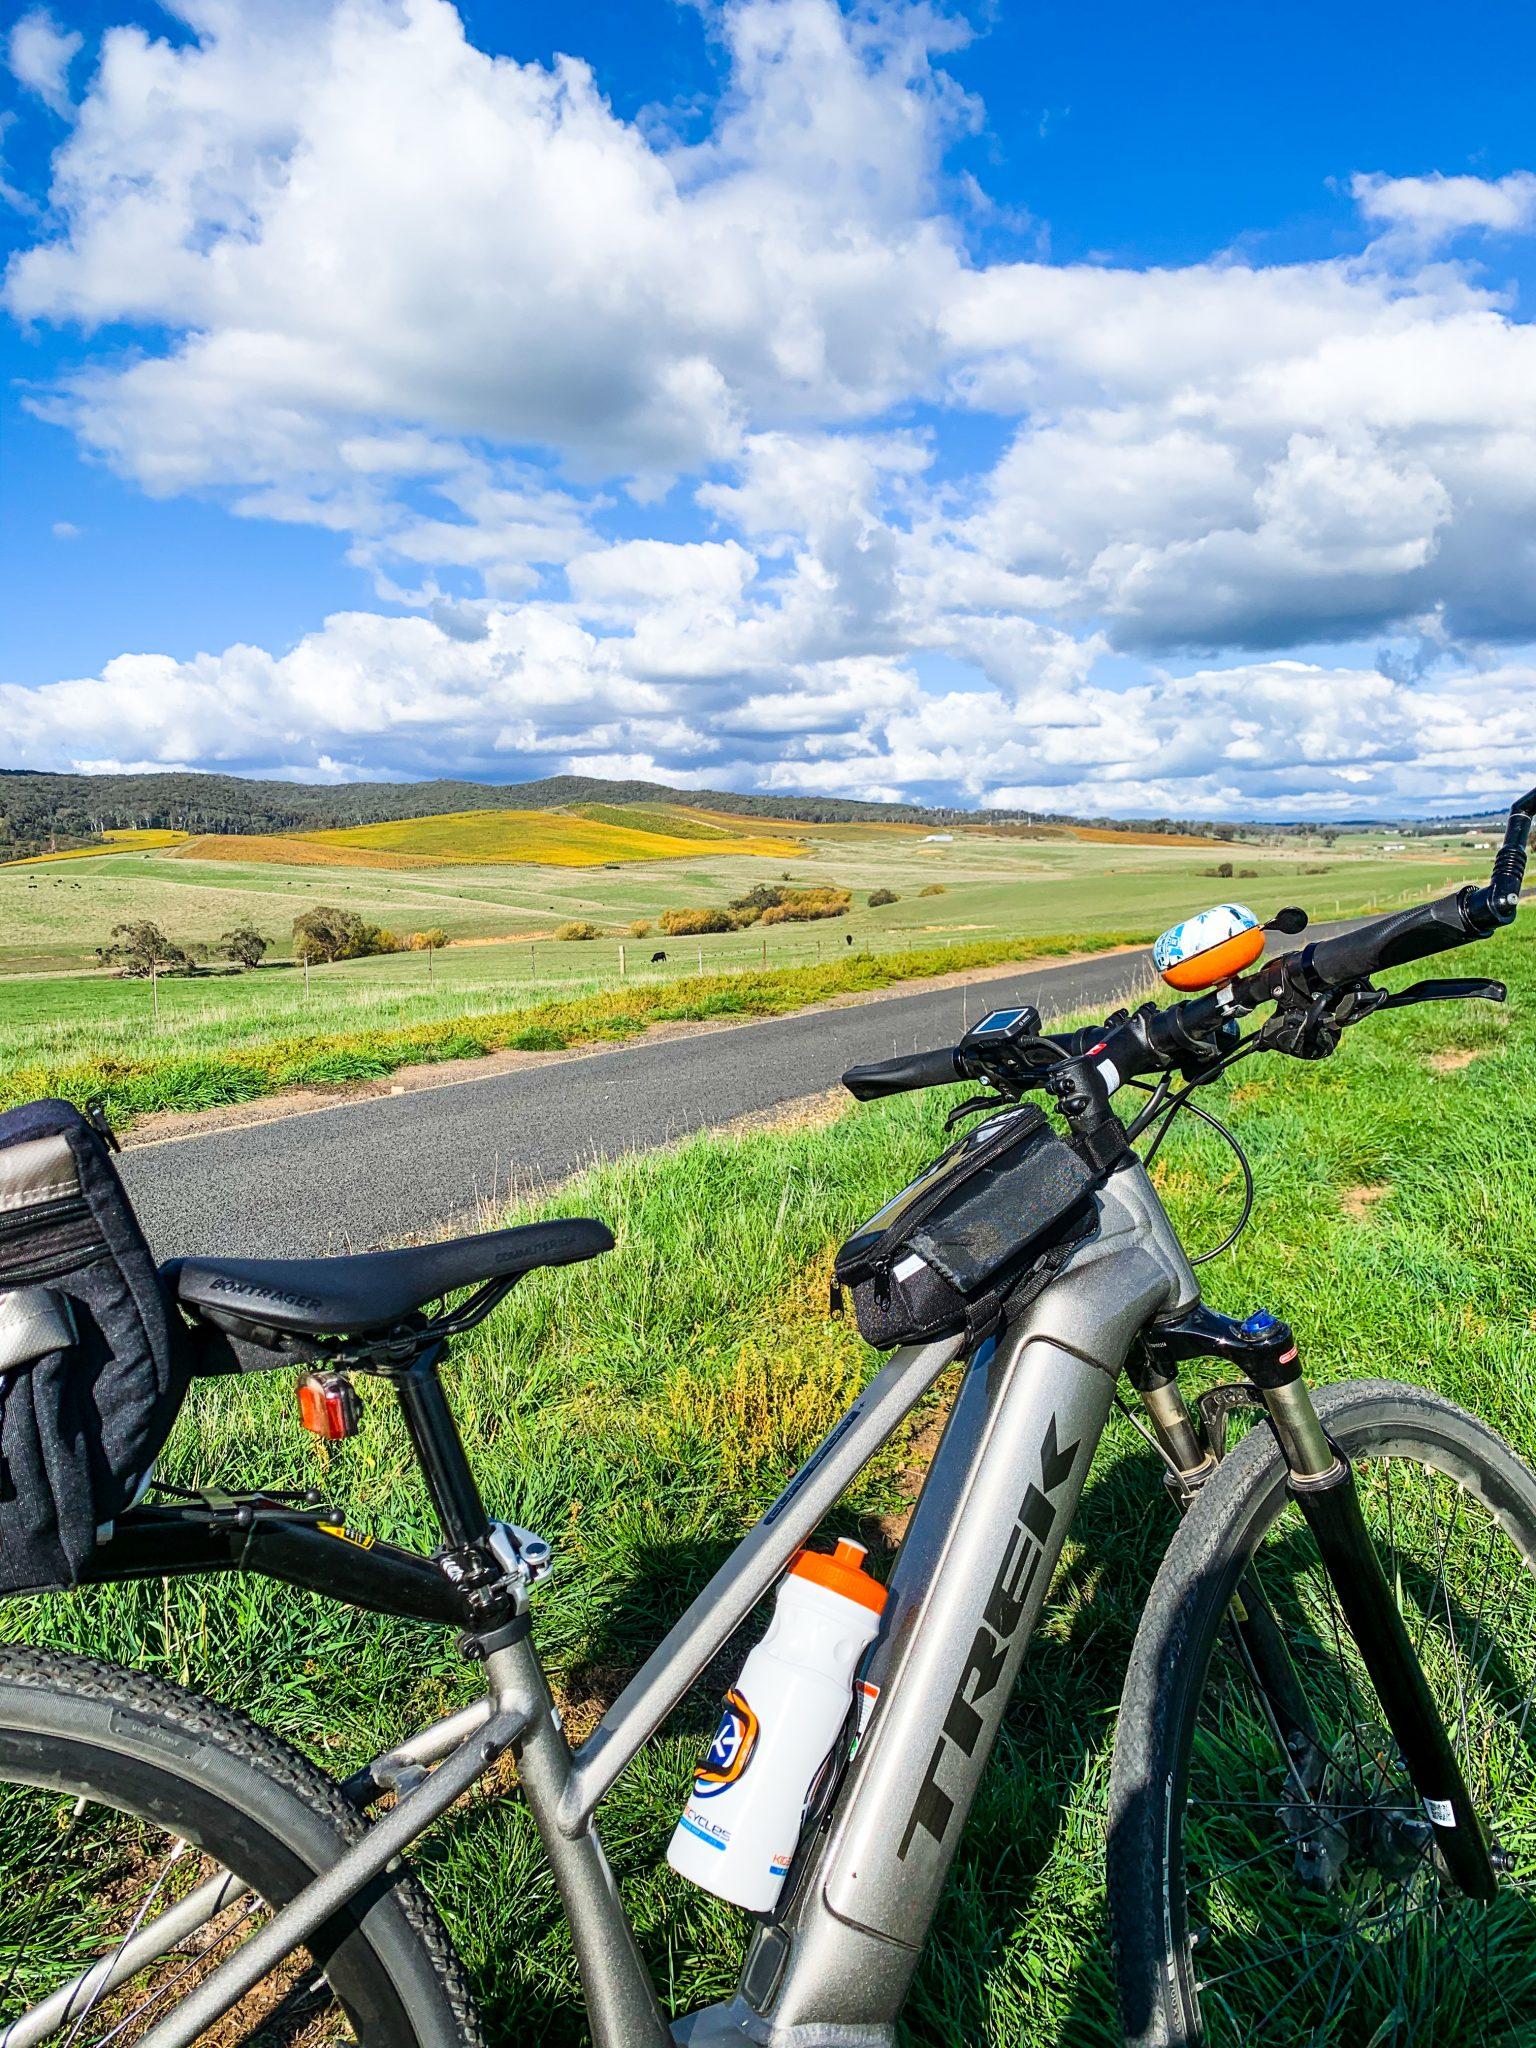 New bike and rail trail views